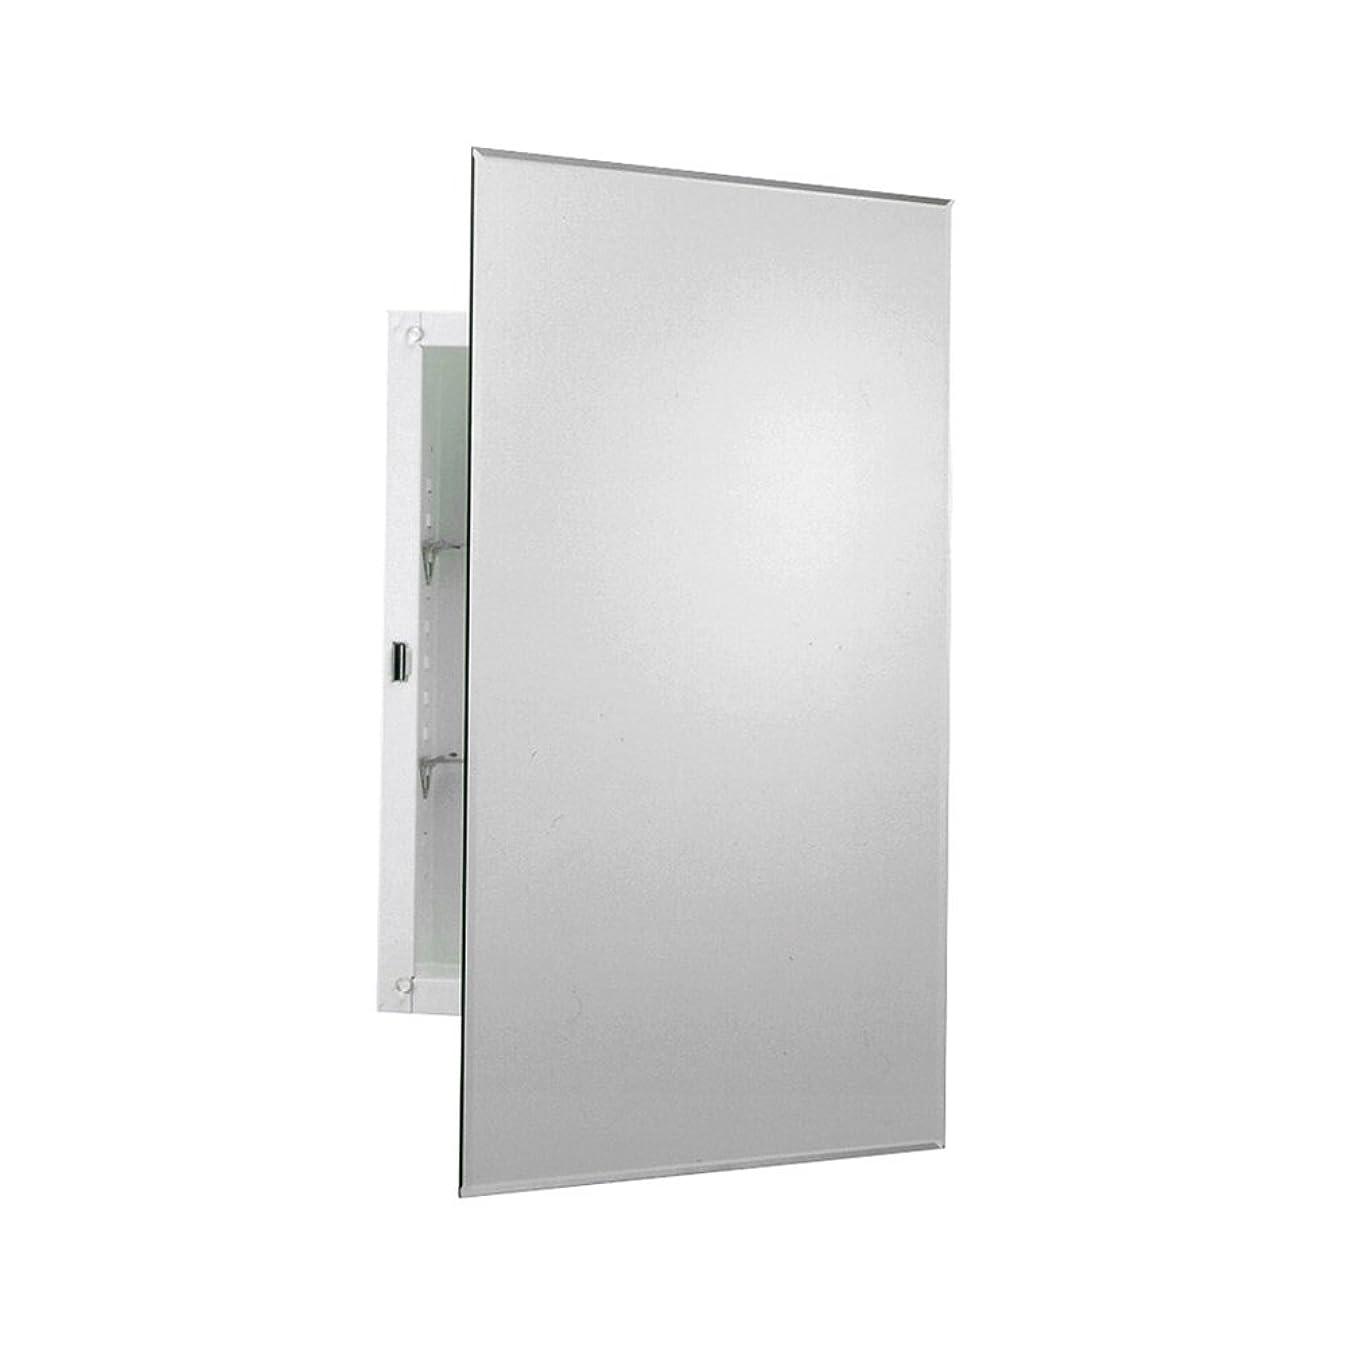 Zenith Products ZPC Corporation EMM1027 Prism Beveled Medicine Cabinet